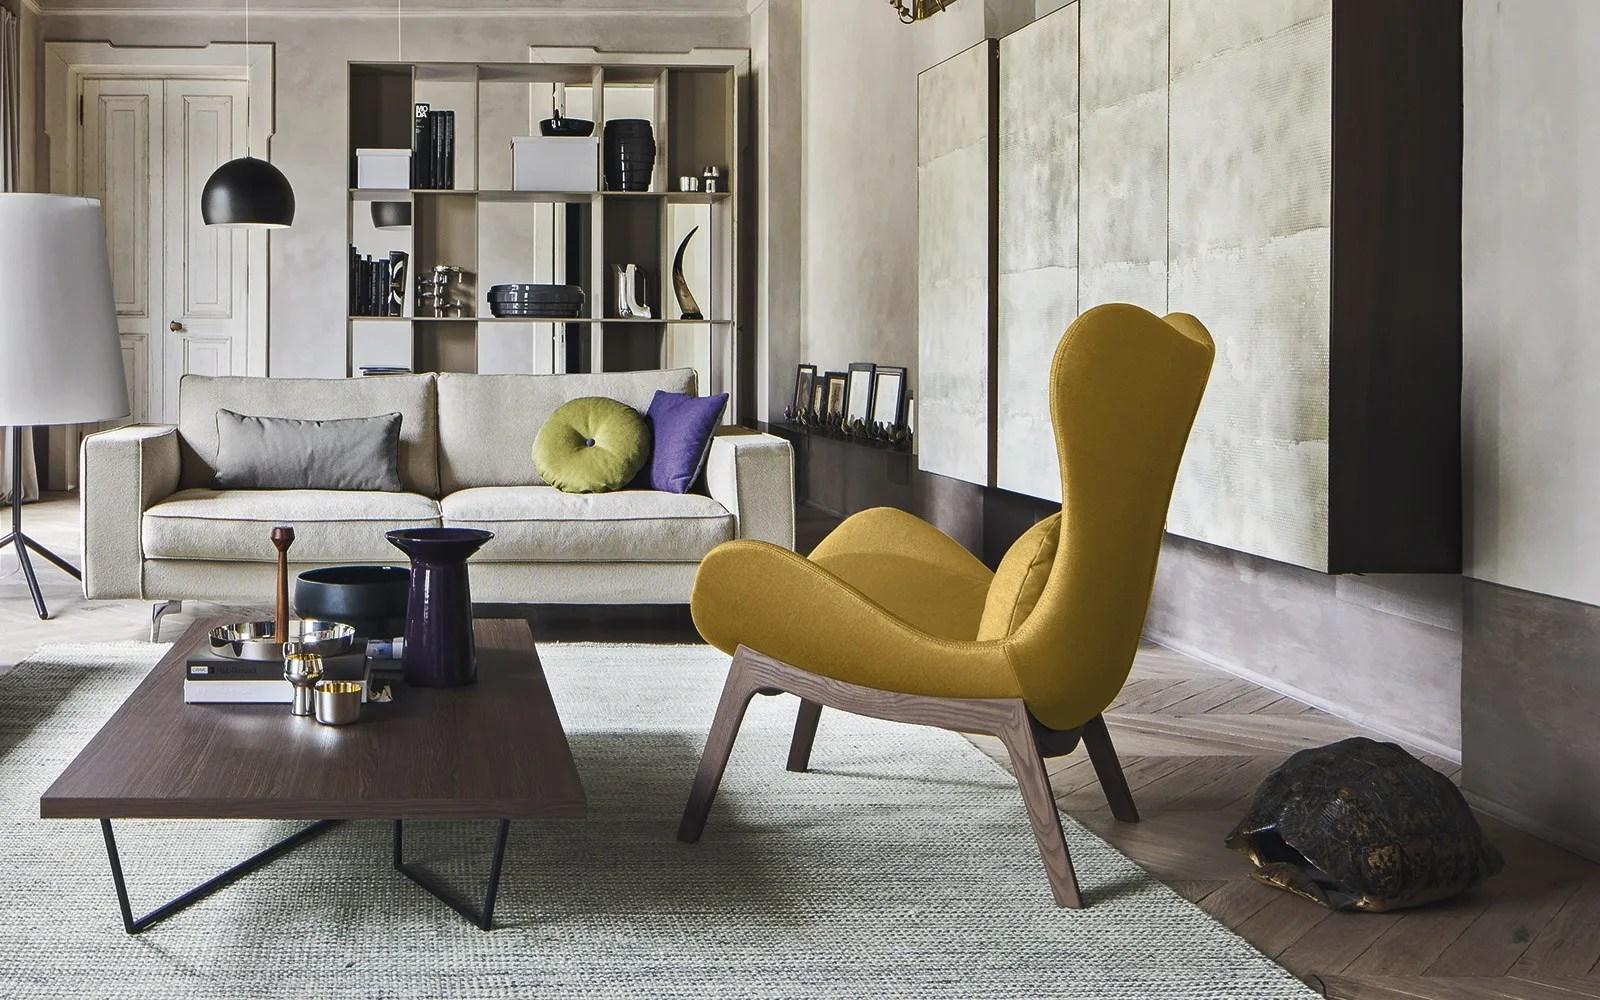 LAZY  Fabric armchair By Calligaris design Michele Menescardi